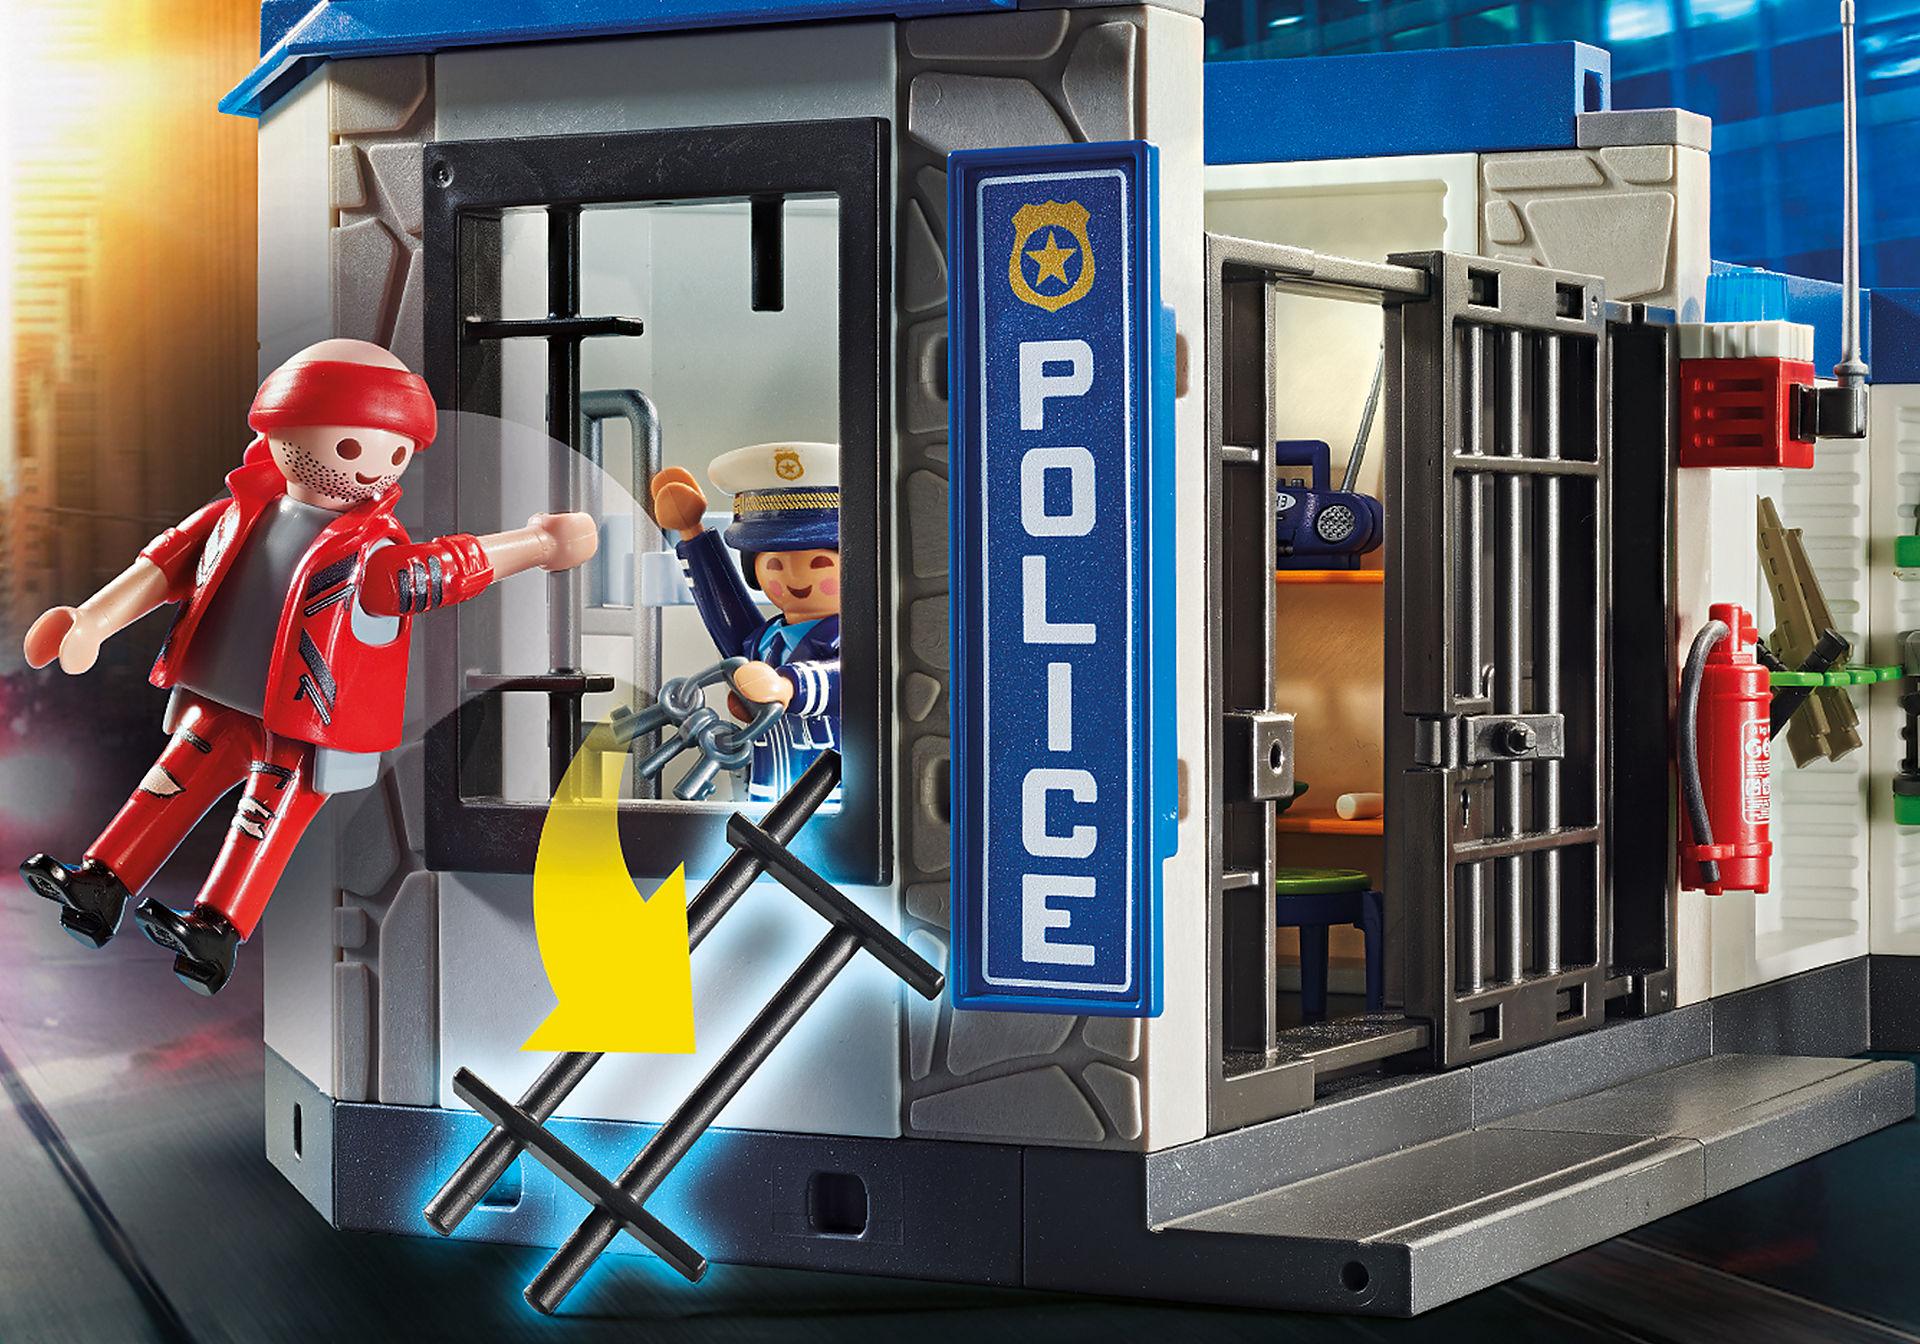 70568 Poliisi: Pako vankilasta zoom image4